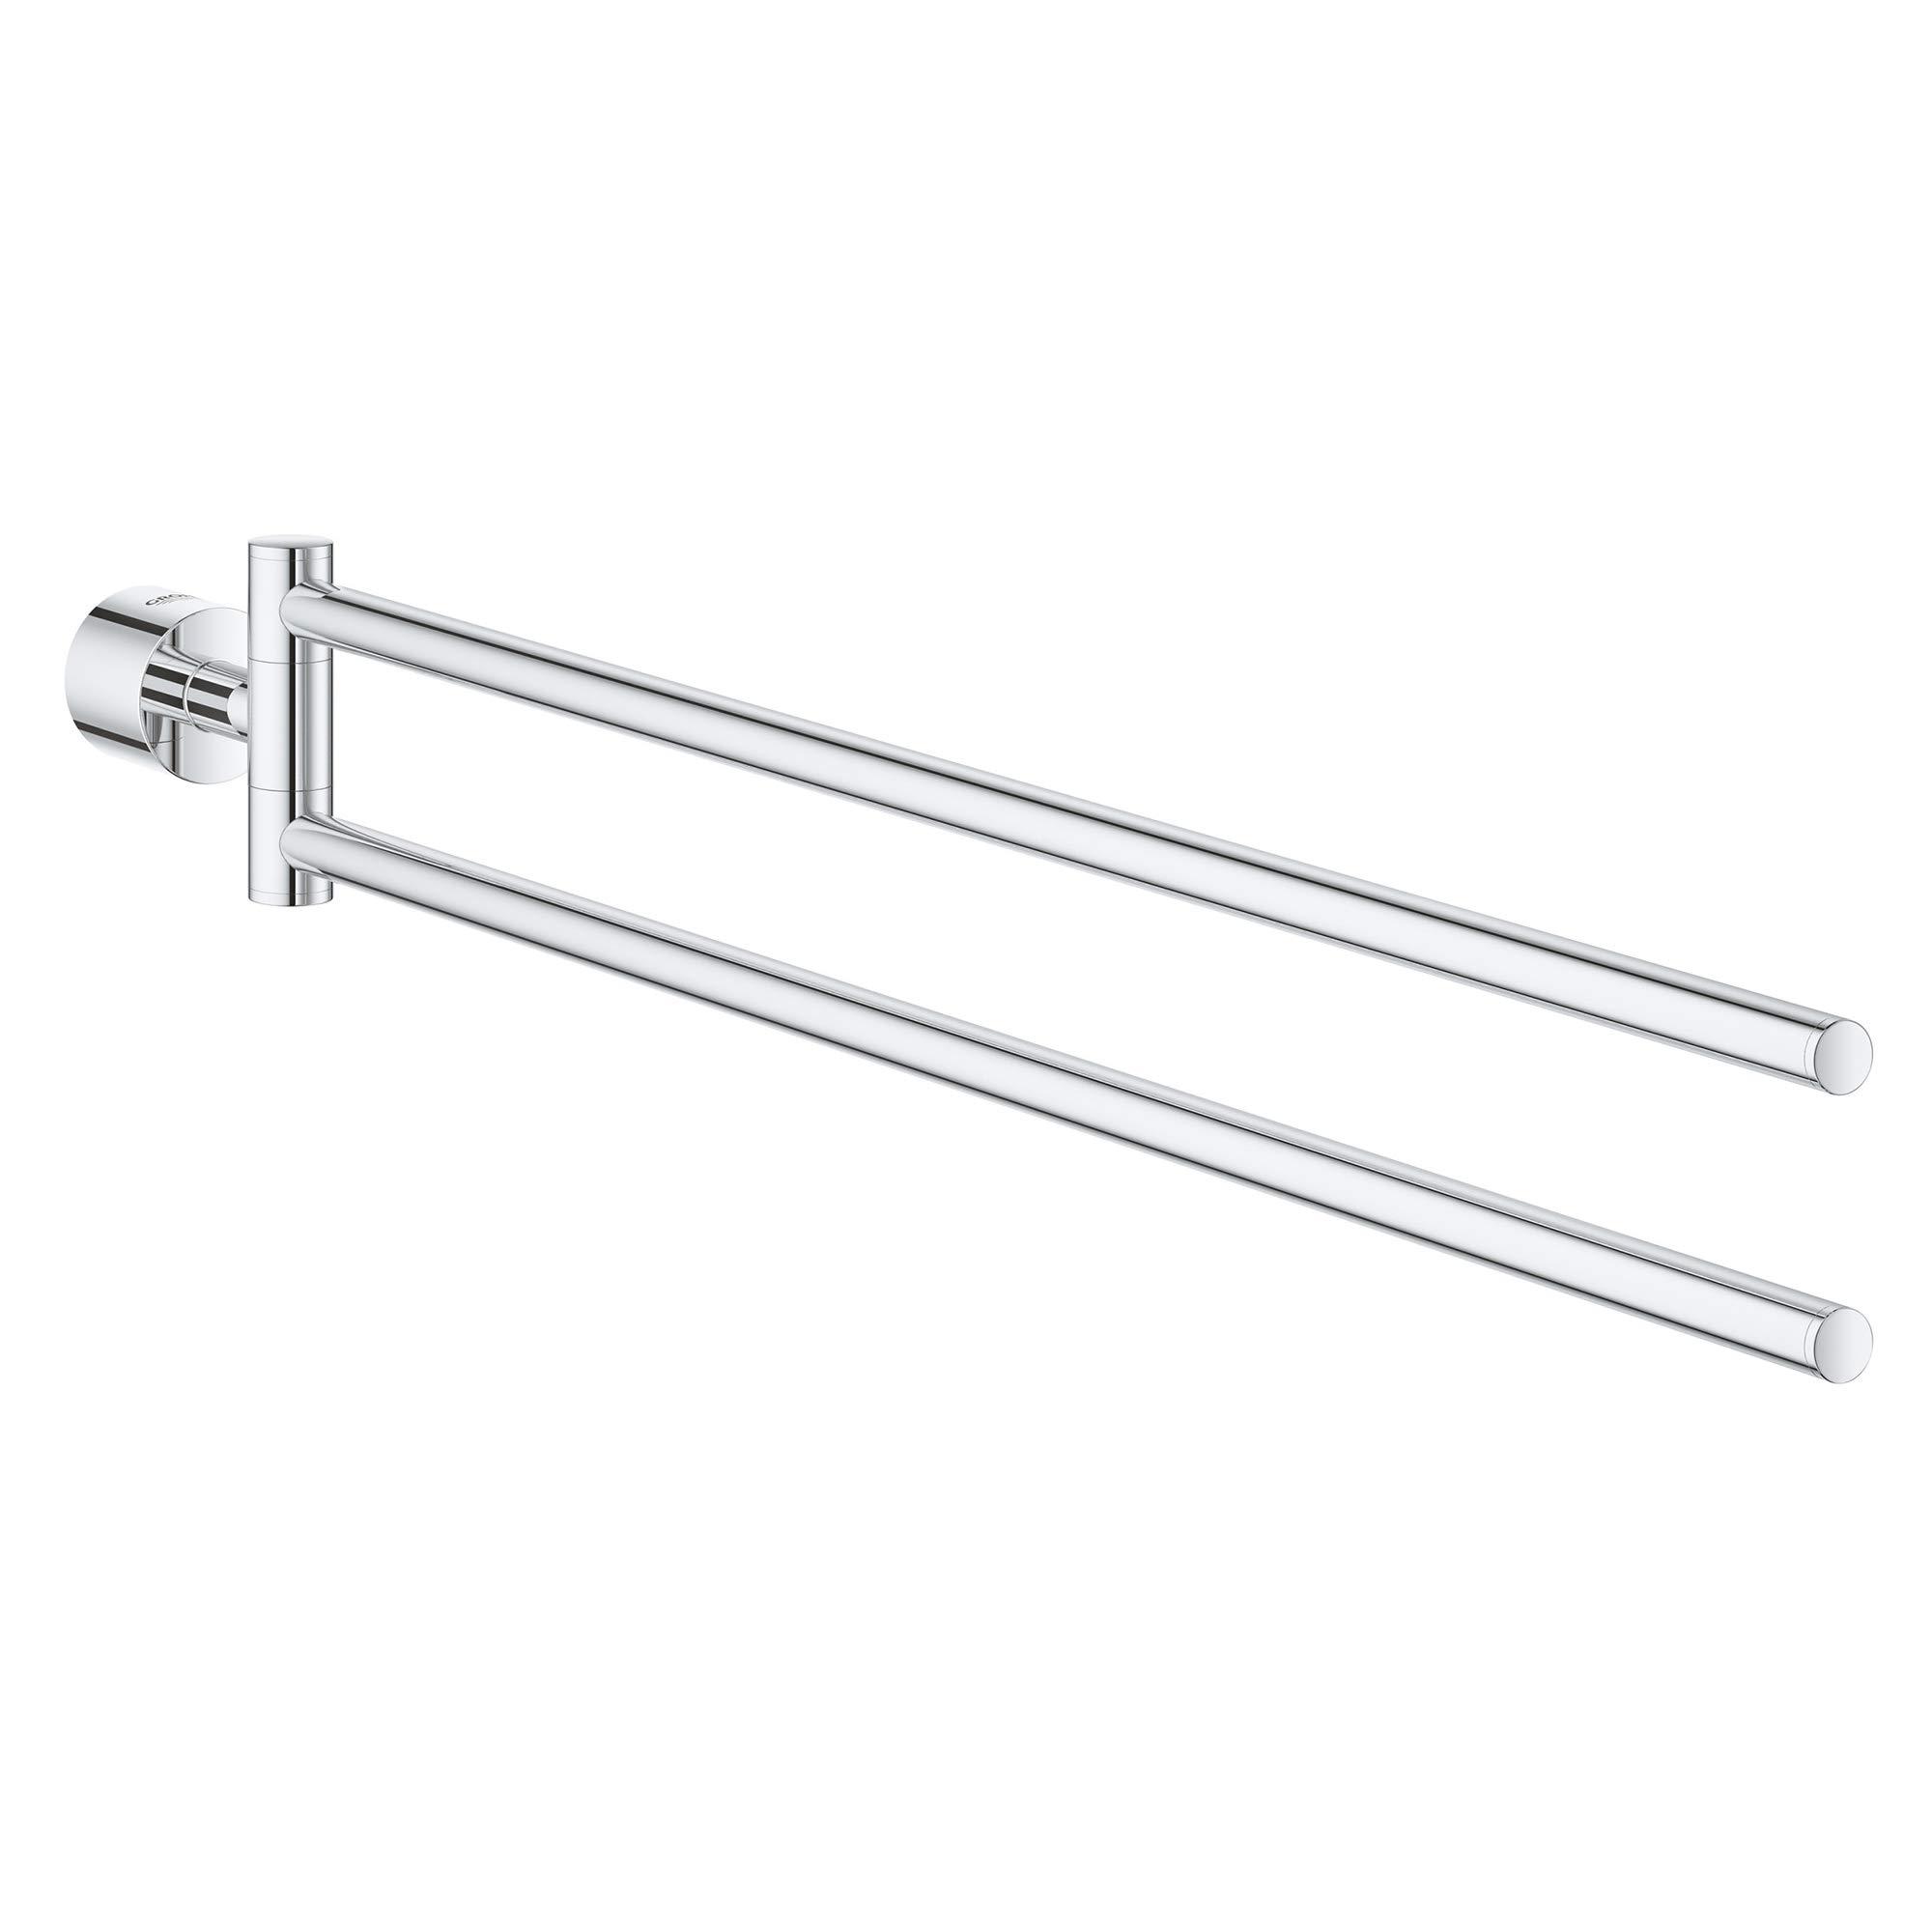 GROHE 40308003 Atrio Double Towel Bar, Starlight Chrome